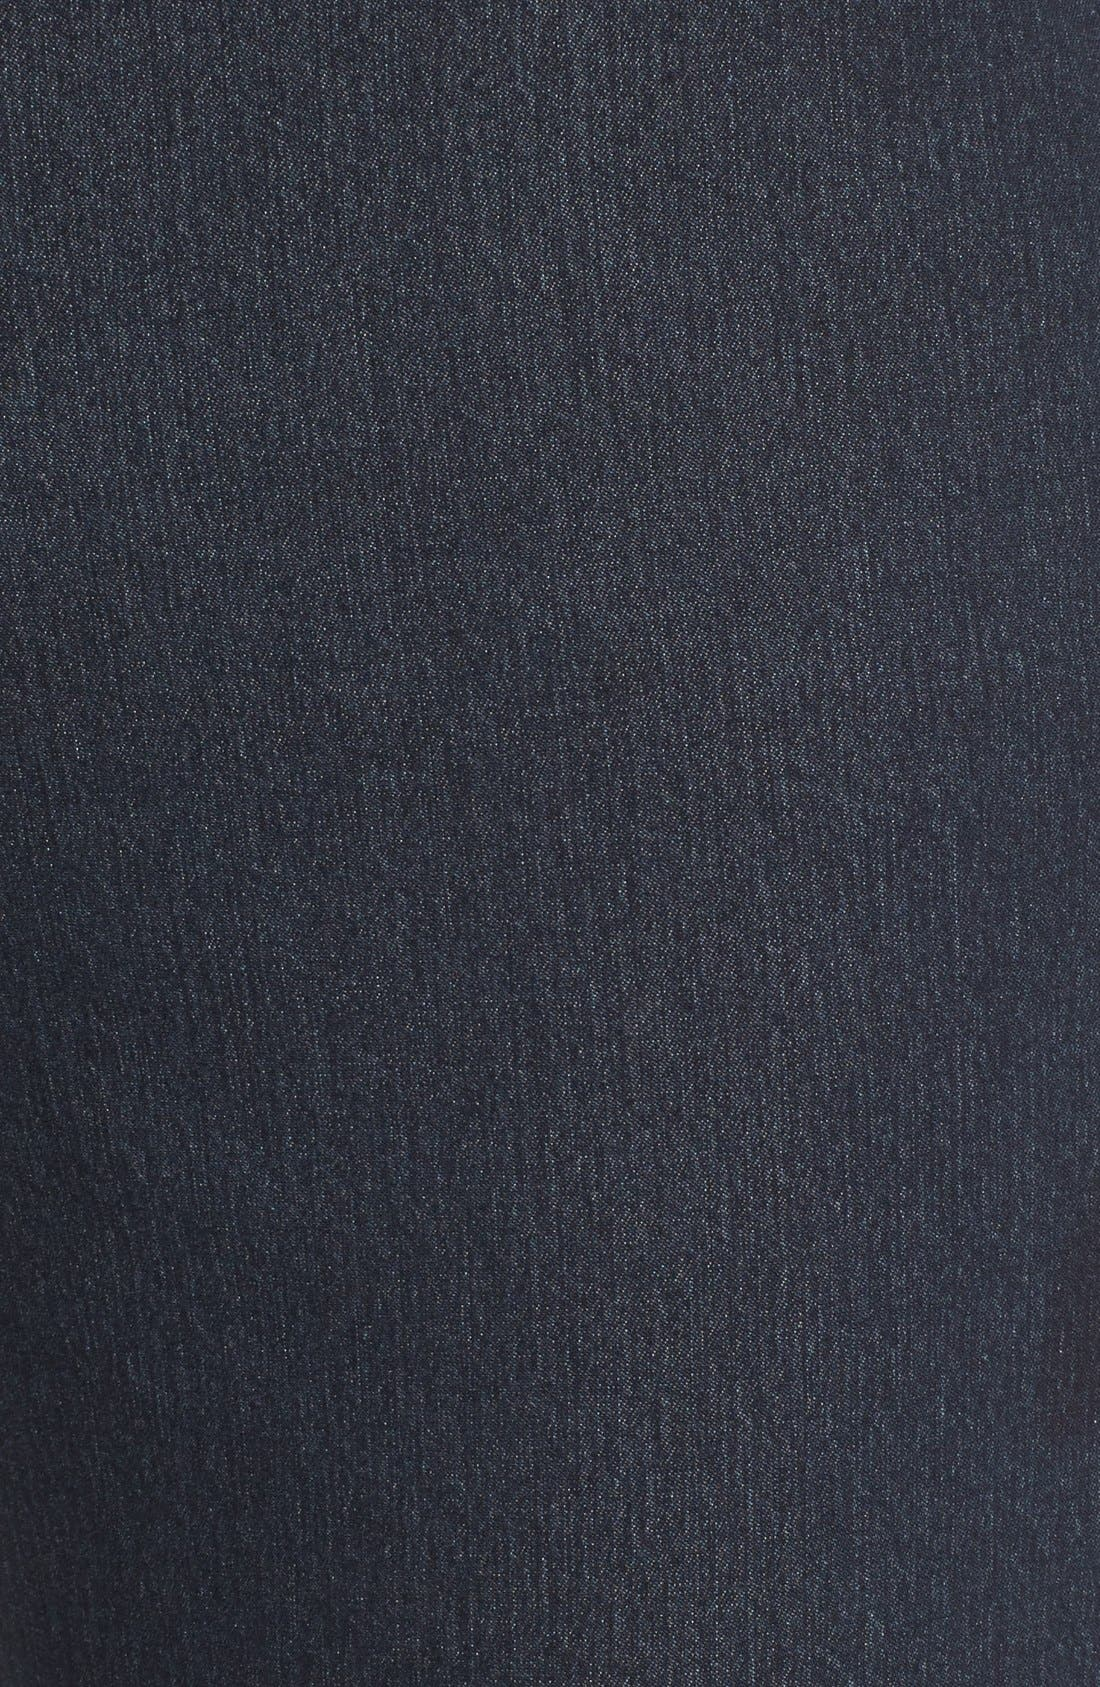 'Primo Denim' Curvy Fit Slim Leg Jeans,                             Alternate thumbnail 6, color,                             INDIGO